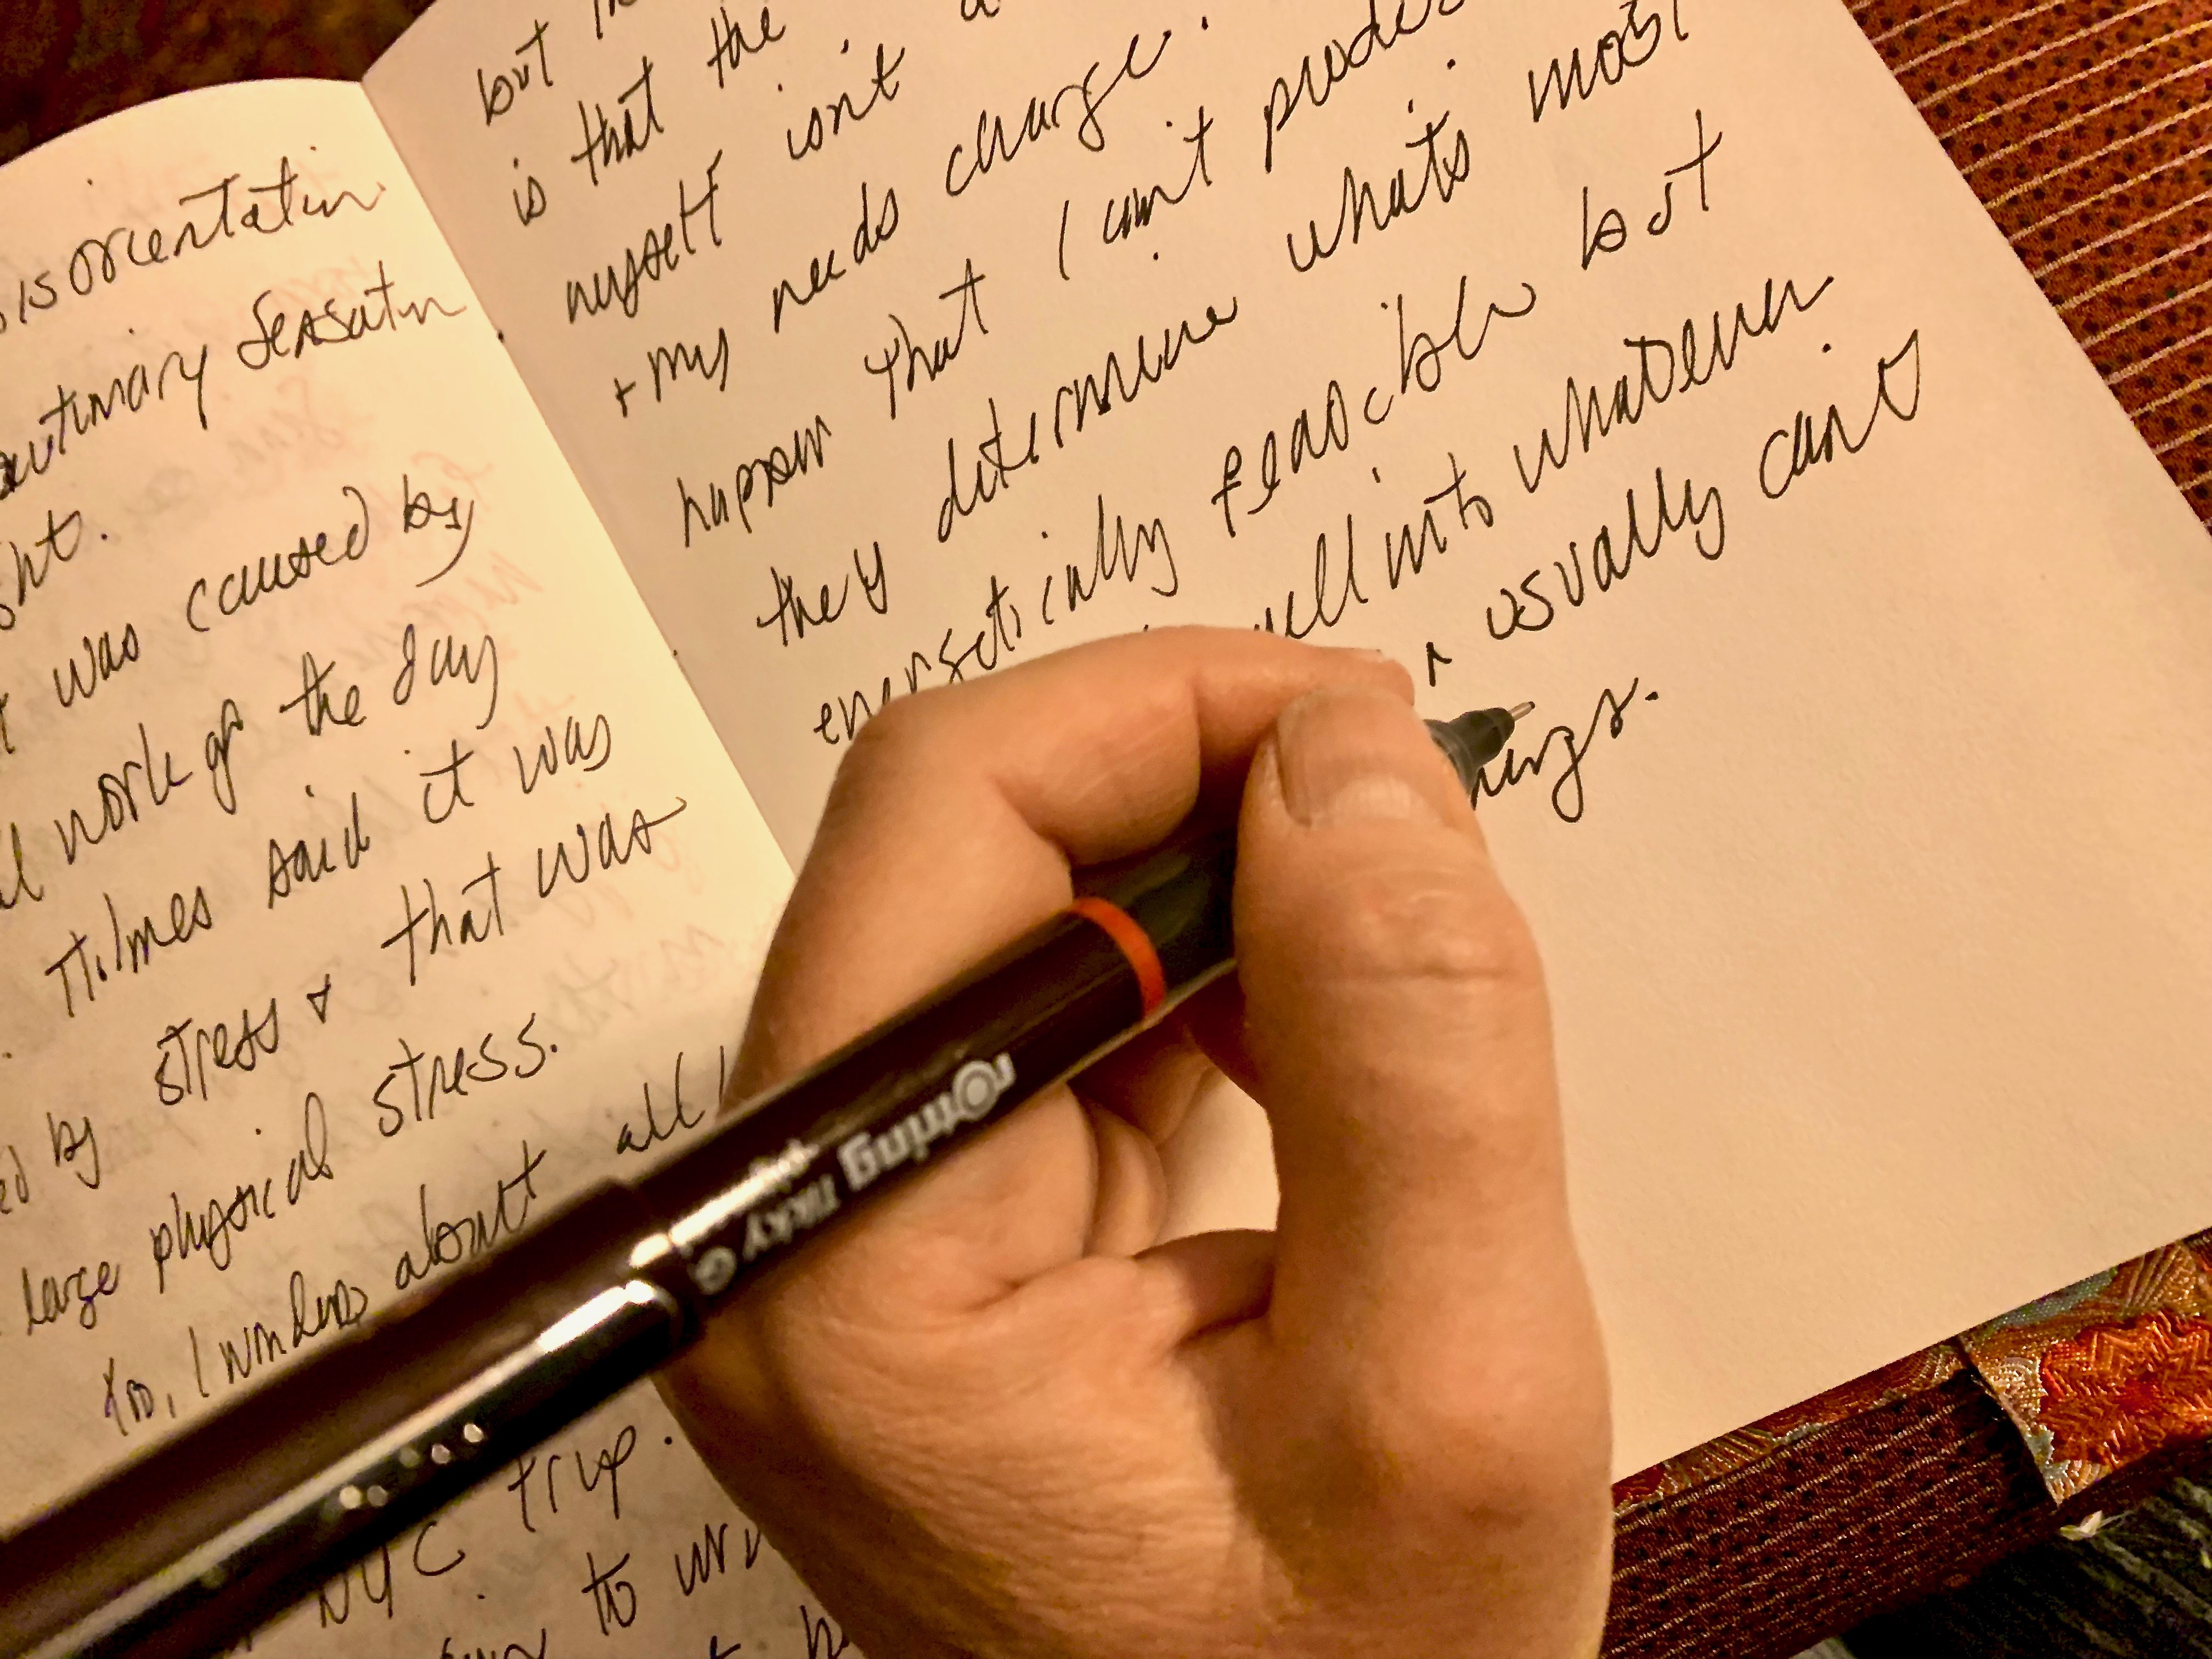 Patrice Vecchione – A Writer's Life